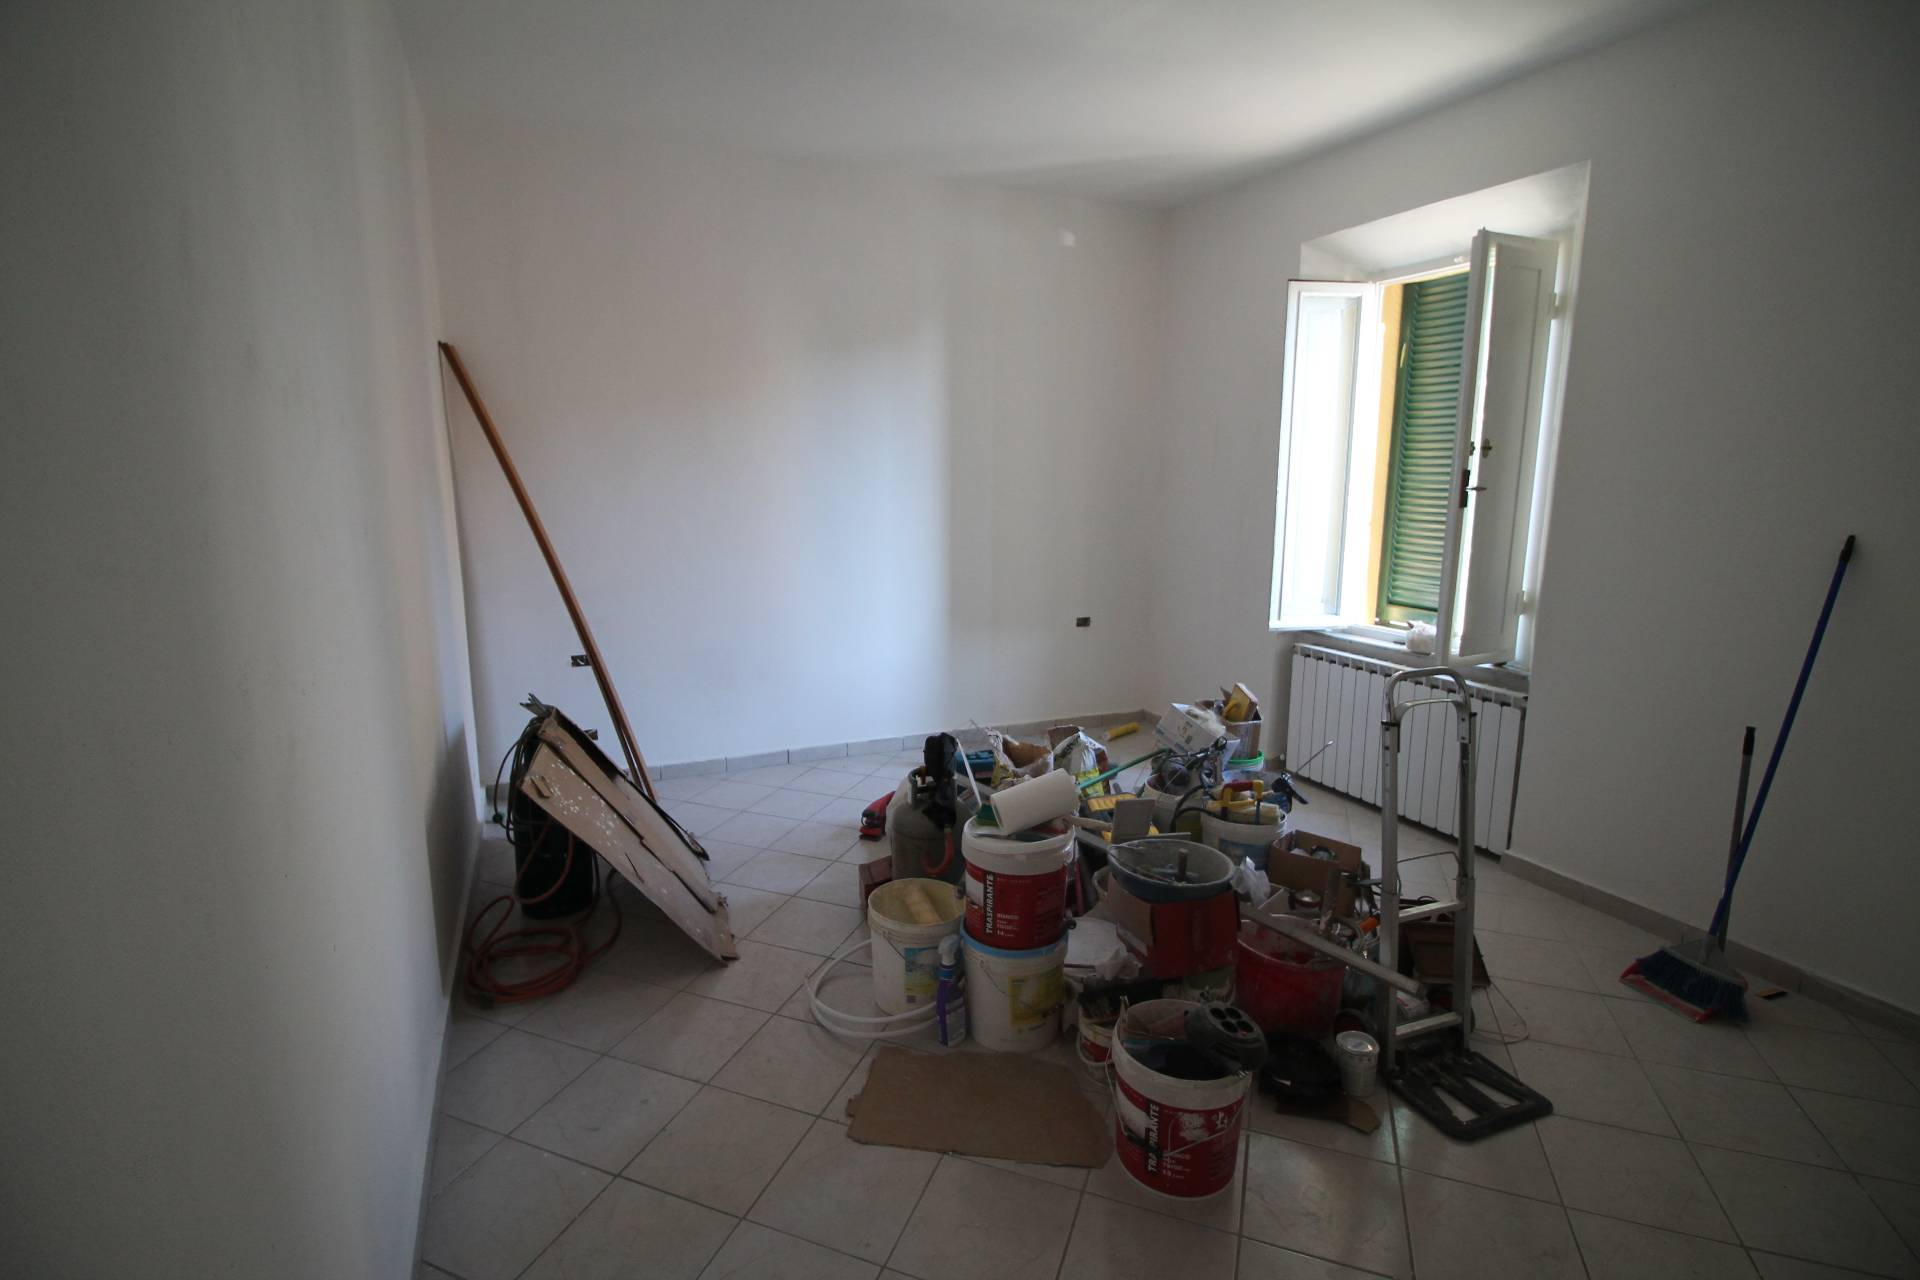 Appartamento in vendita, rif. V2789B